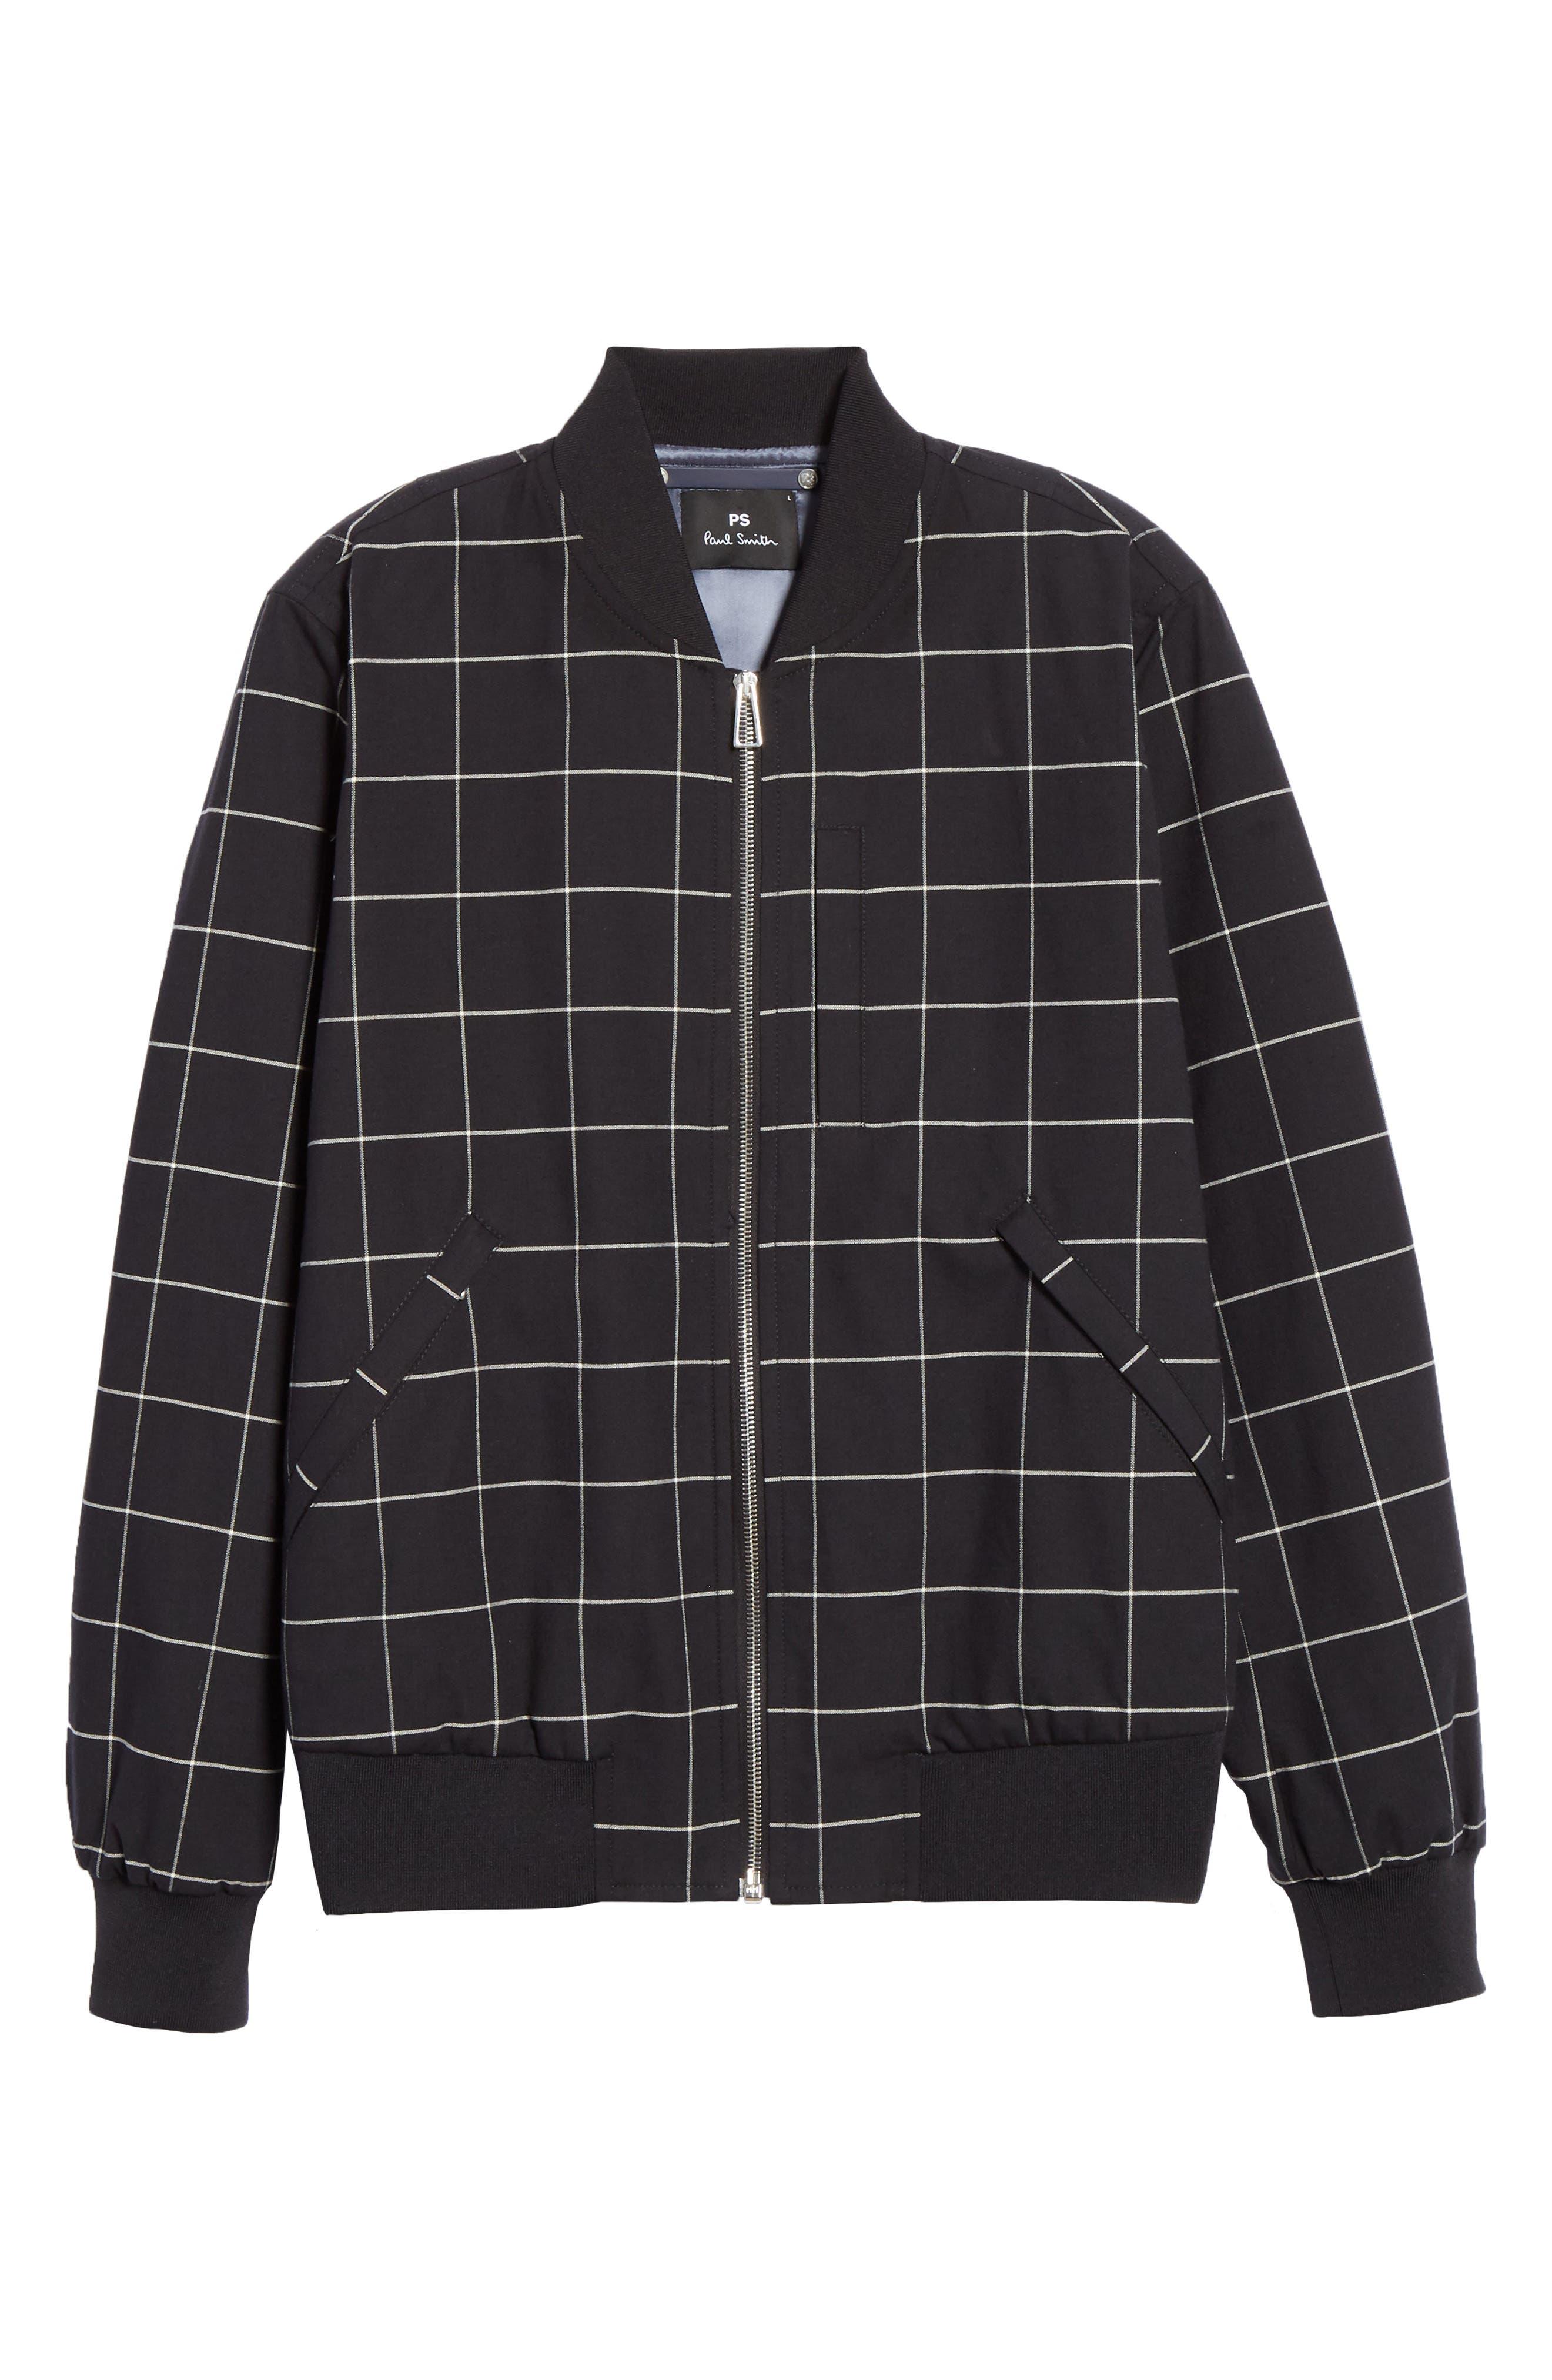 PS PAUL SMITH, Grid Wool Blend Bomber Jacket, Alternate thumbnail 5, color, BLACK